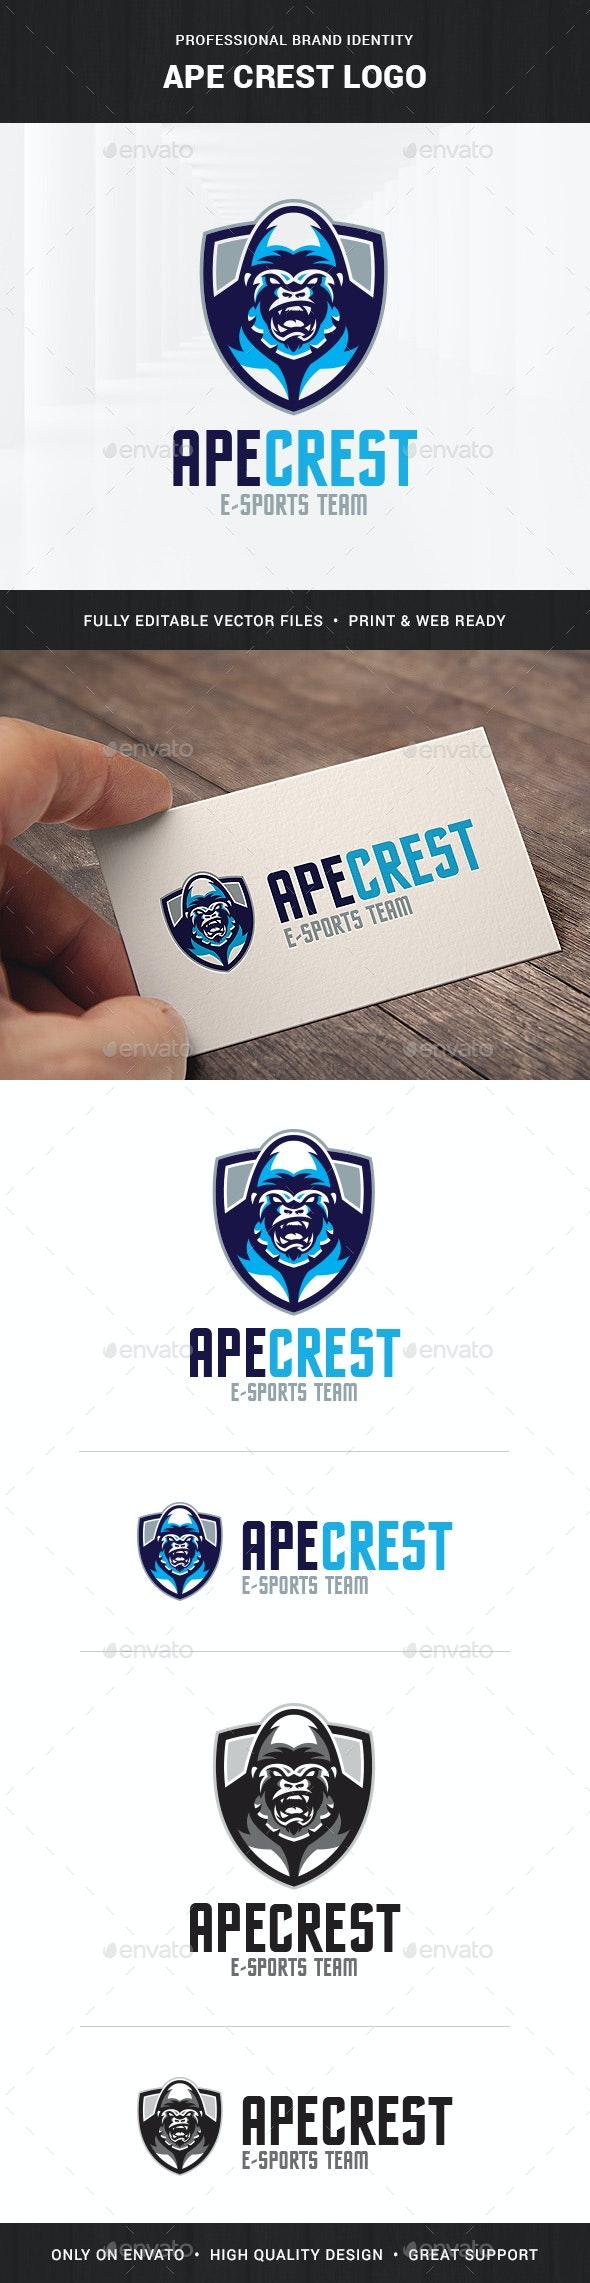 Ape Crest Logo Template - Animals Logo Templates